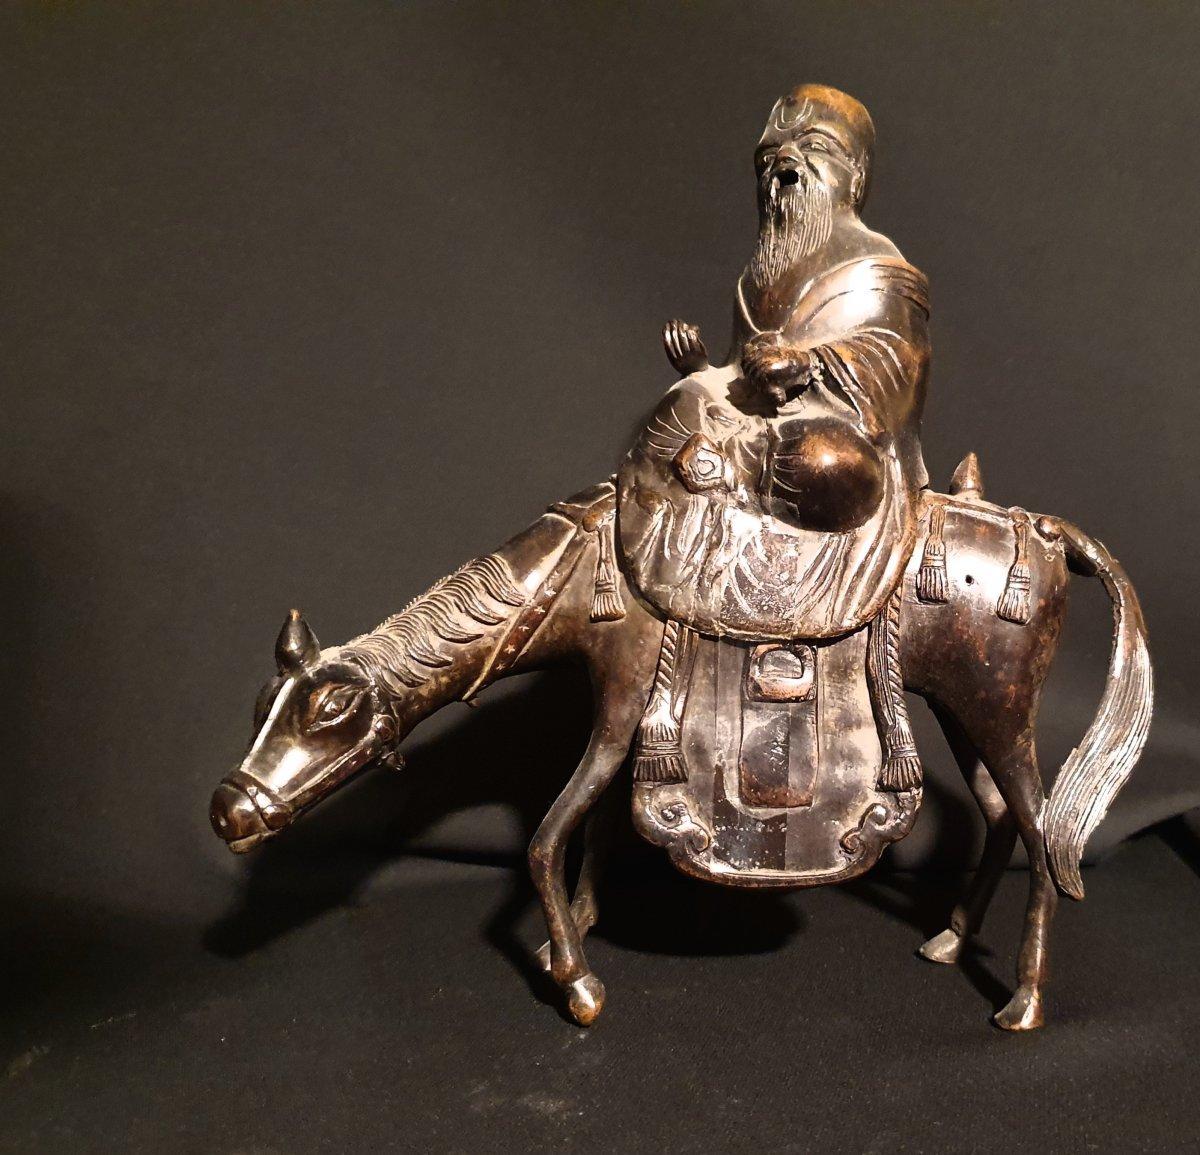 Bronze, Probably 19th Century China